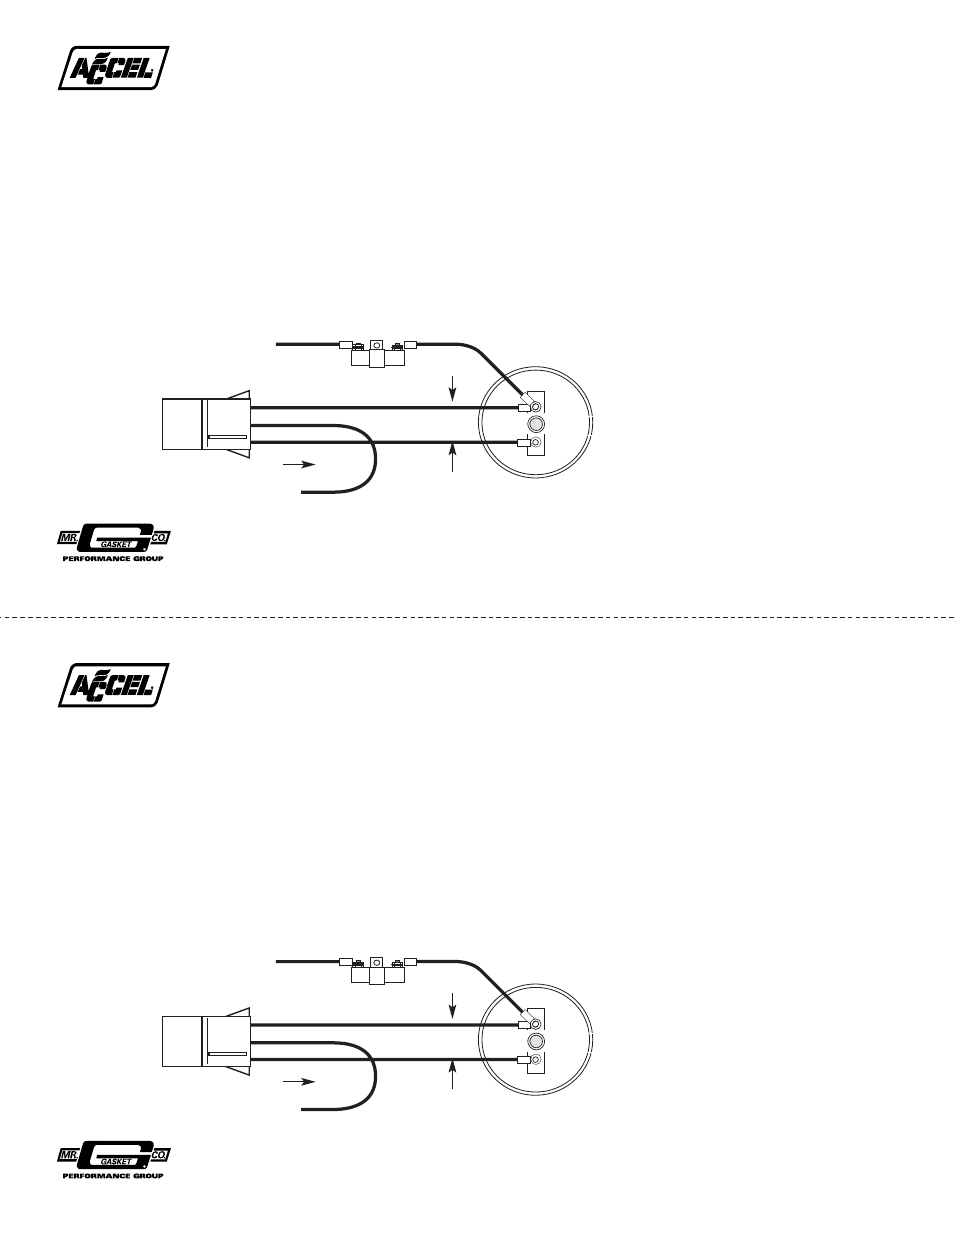 Accel points eliminator wiring diagram | Find image on hei distributor wiring diagram, basic ignition wiring diagram, triumph chopper wiring diagram, msd ignition wiring diagram, simple harley wiring diagram, mallory ignition wiring diagram,